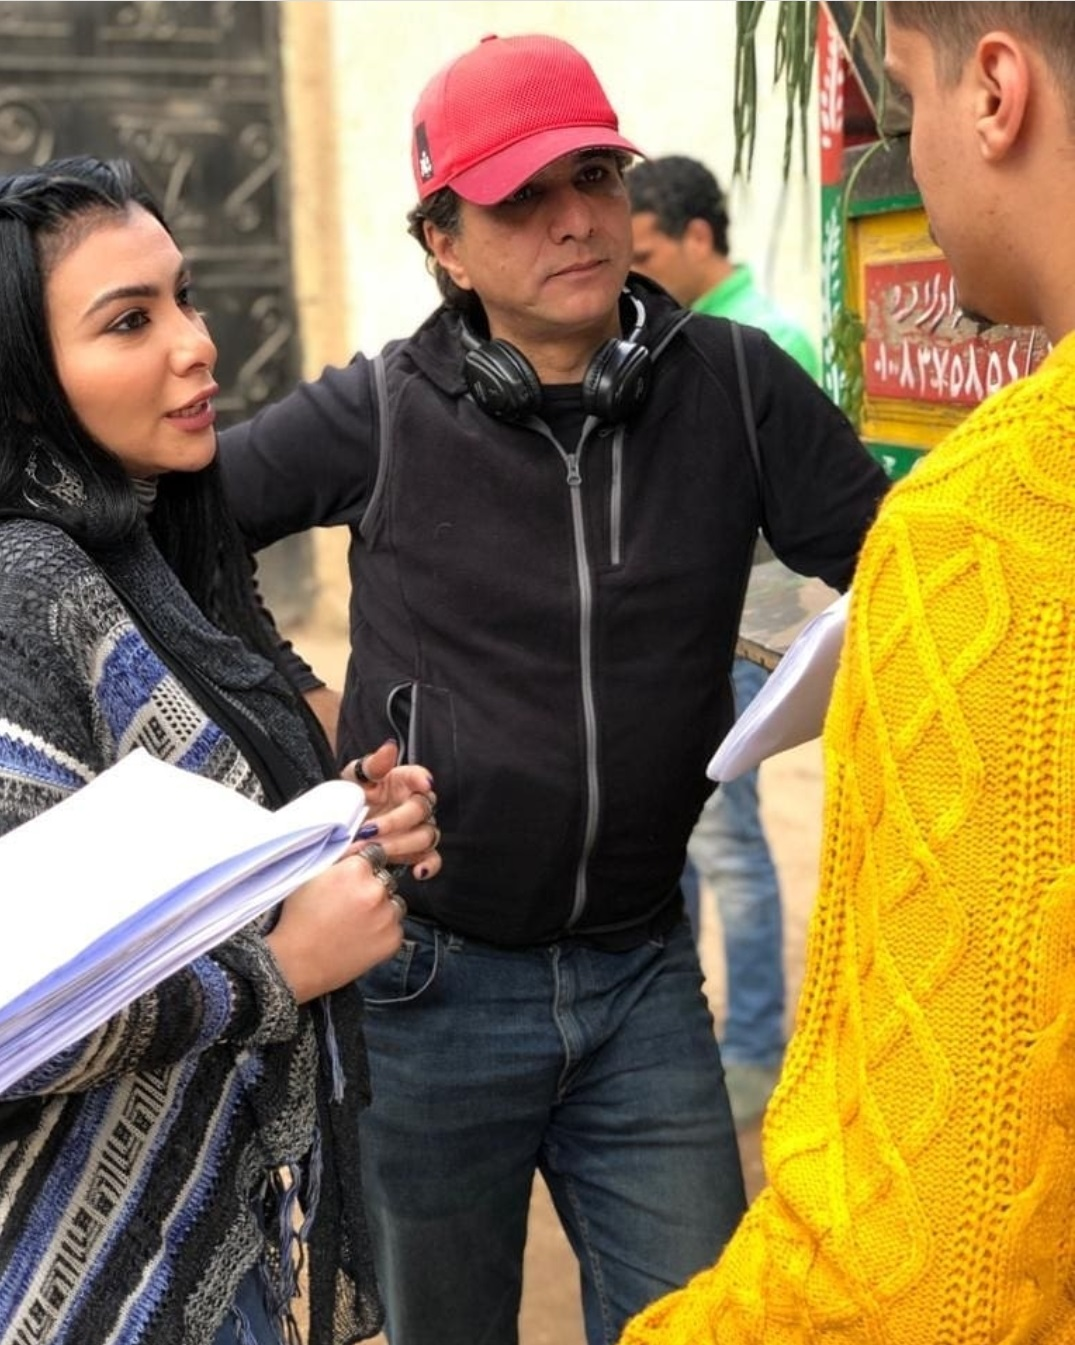 ميرهان حسين مع المخرج سميح انقاش